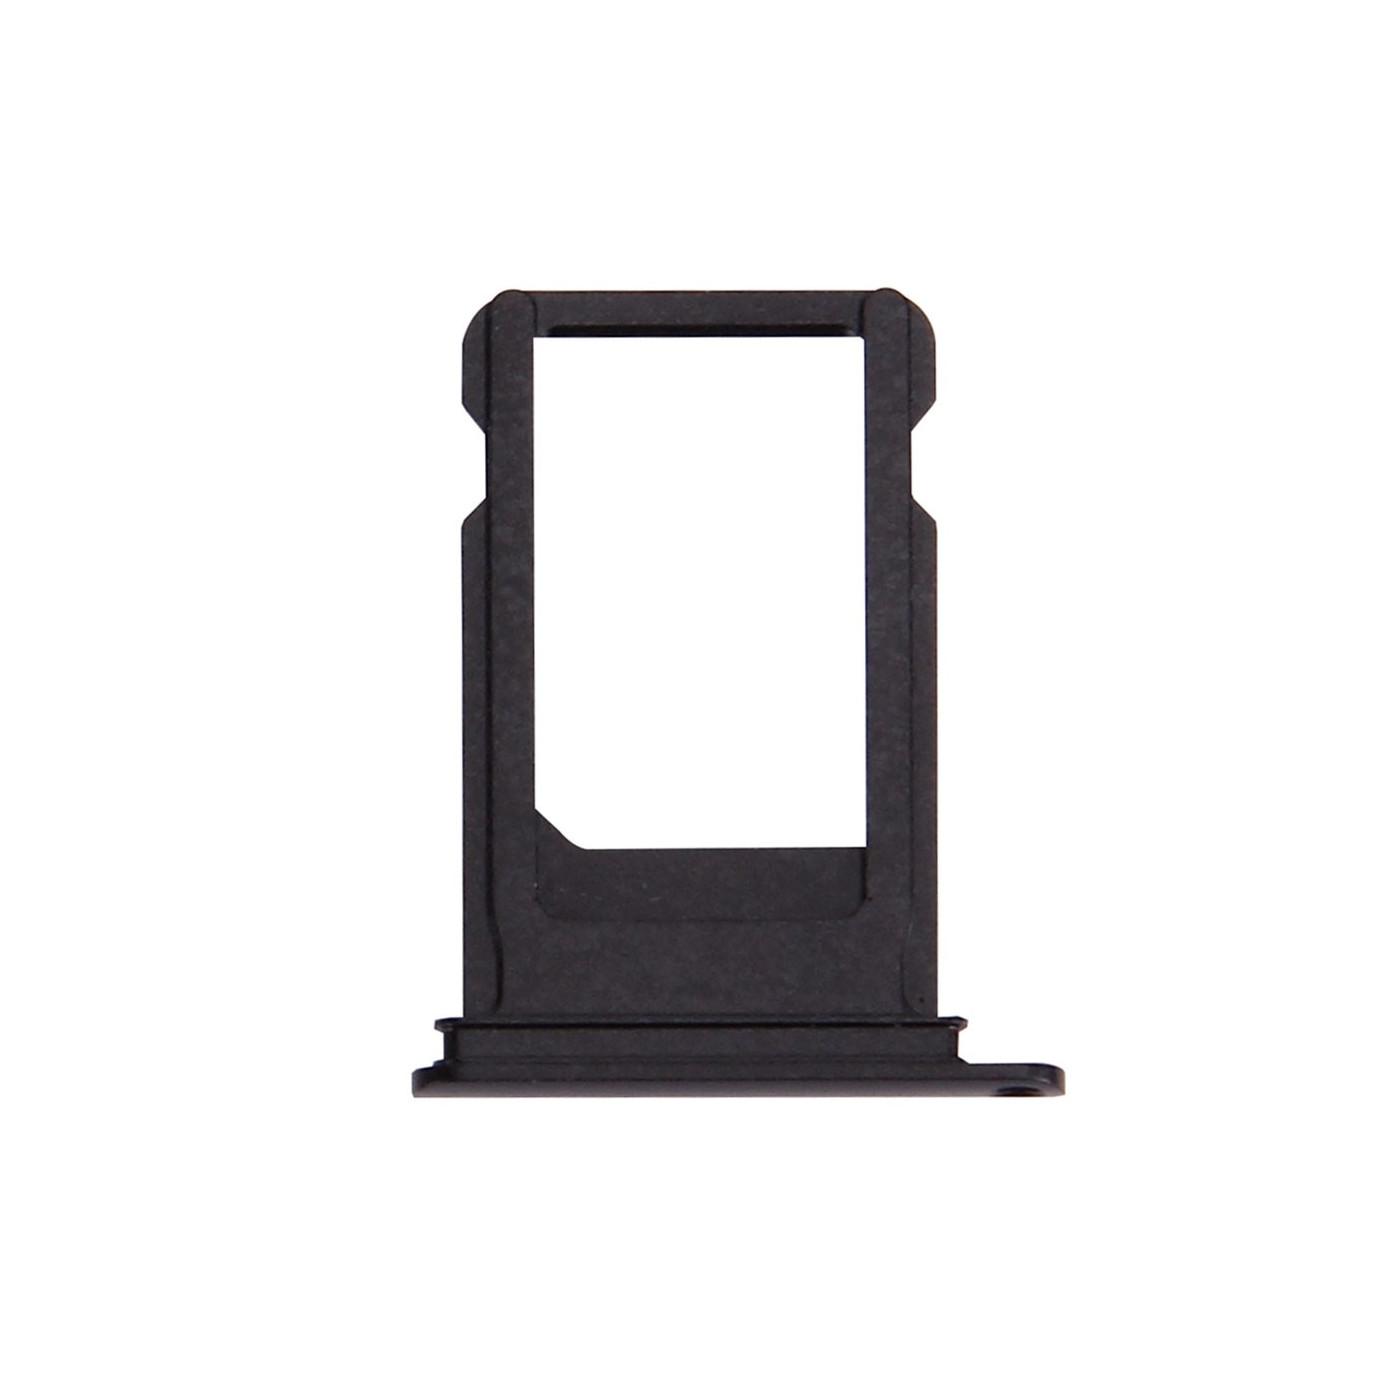 TARJETA SIM CARD Apple iPhone 7 PLUS Black SLOT SLIDE TROLLEY BANDEJA REEMPLAZO